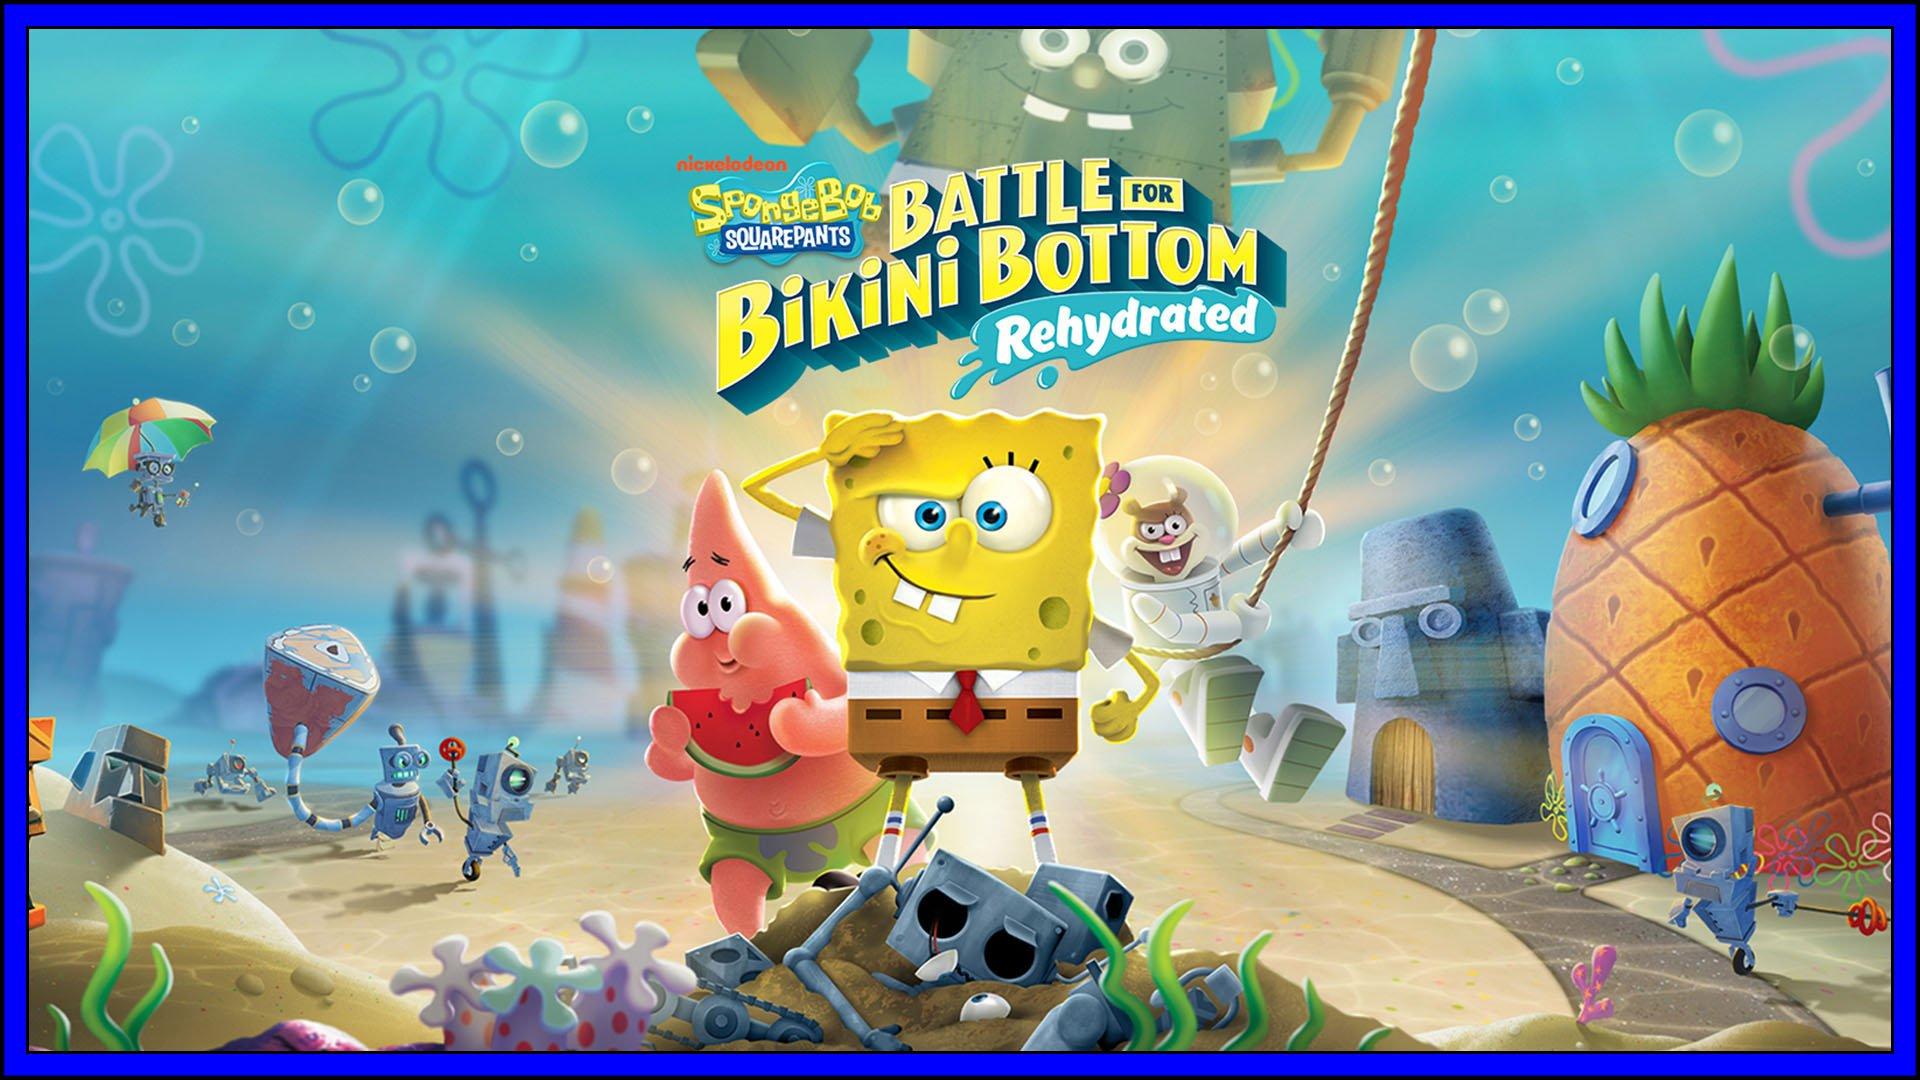 SpongeBob SquarePants: Battle for Bikini Bottom – Rehydrated (PS4) Review